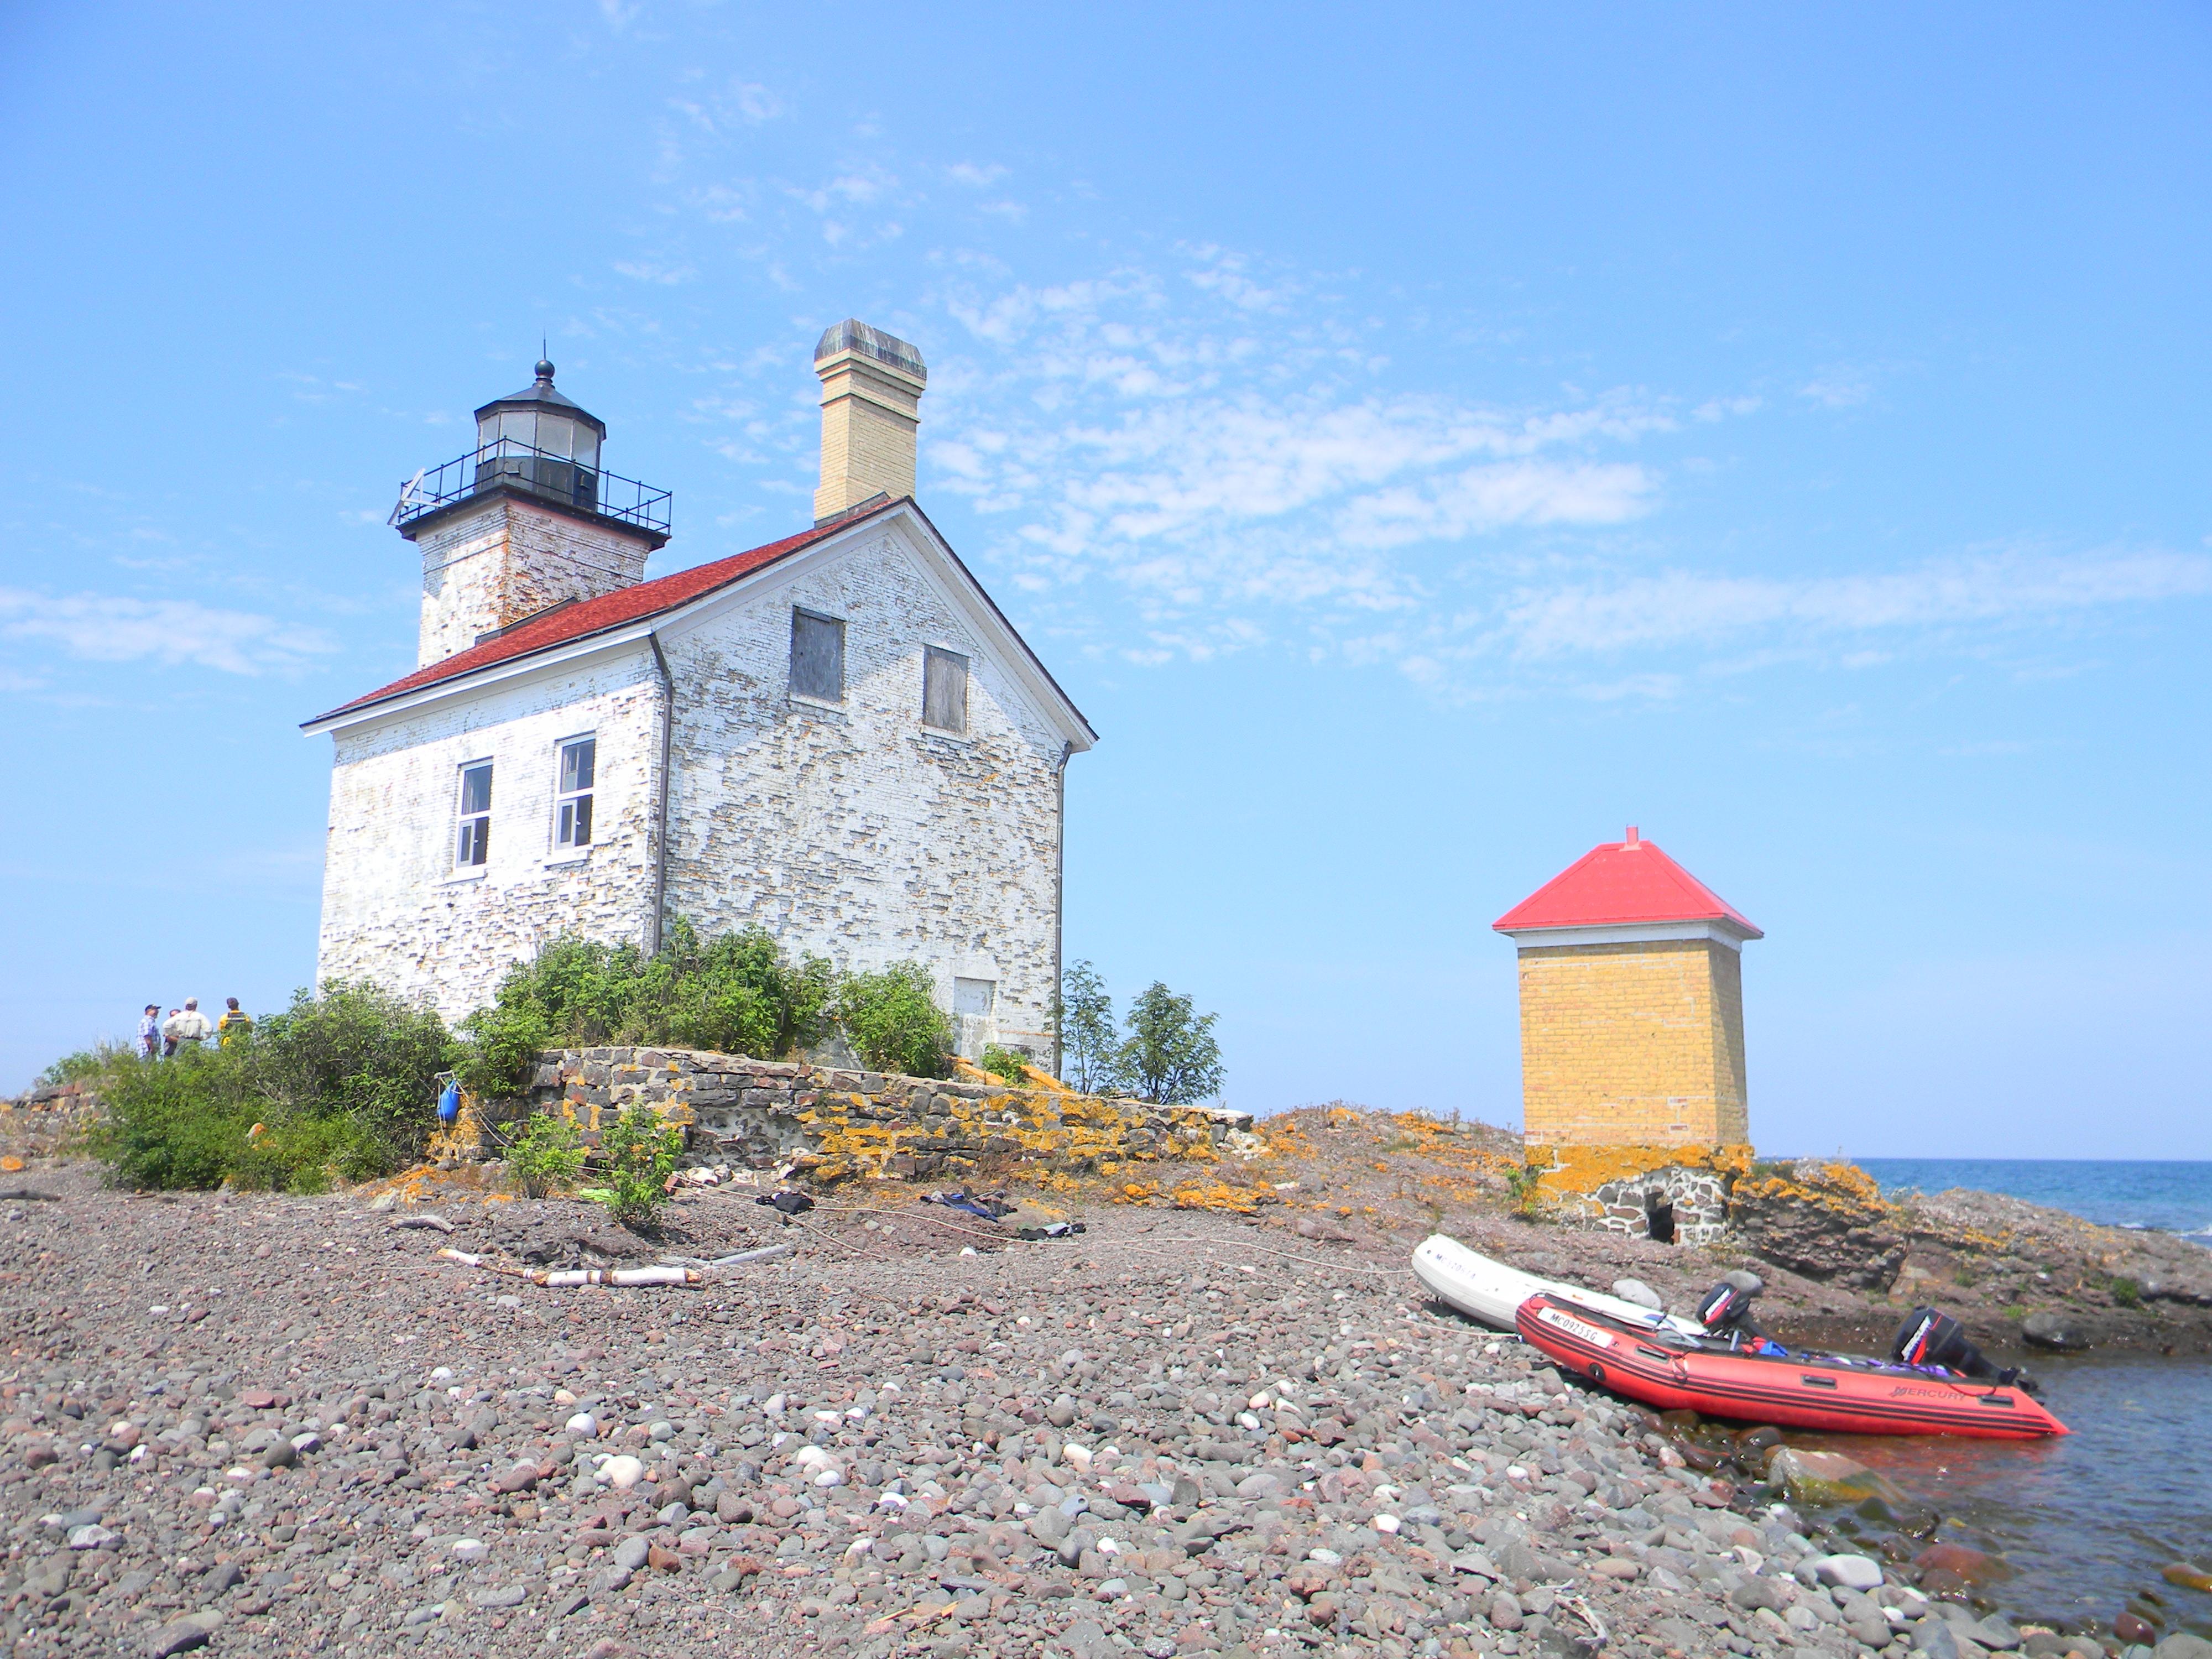 Gull rock lighthouse interior rehabilitation mlapgrants blog for Light house interior